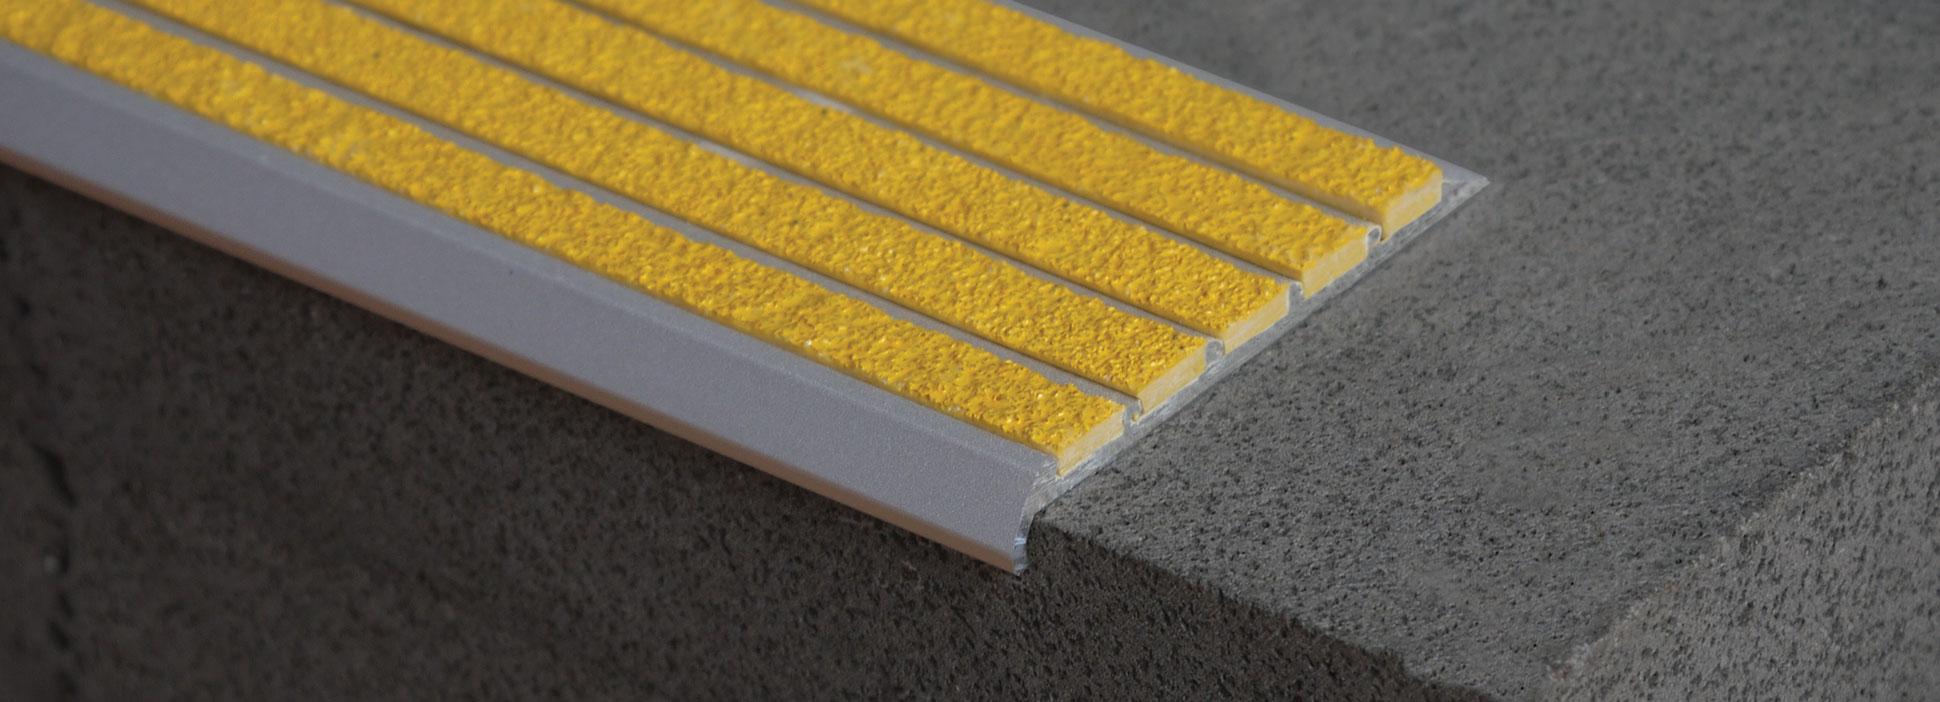 HiLight-FiveBar_Yellow.jpg